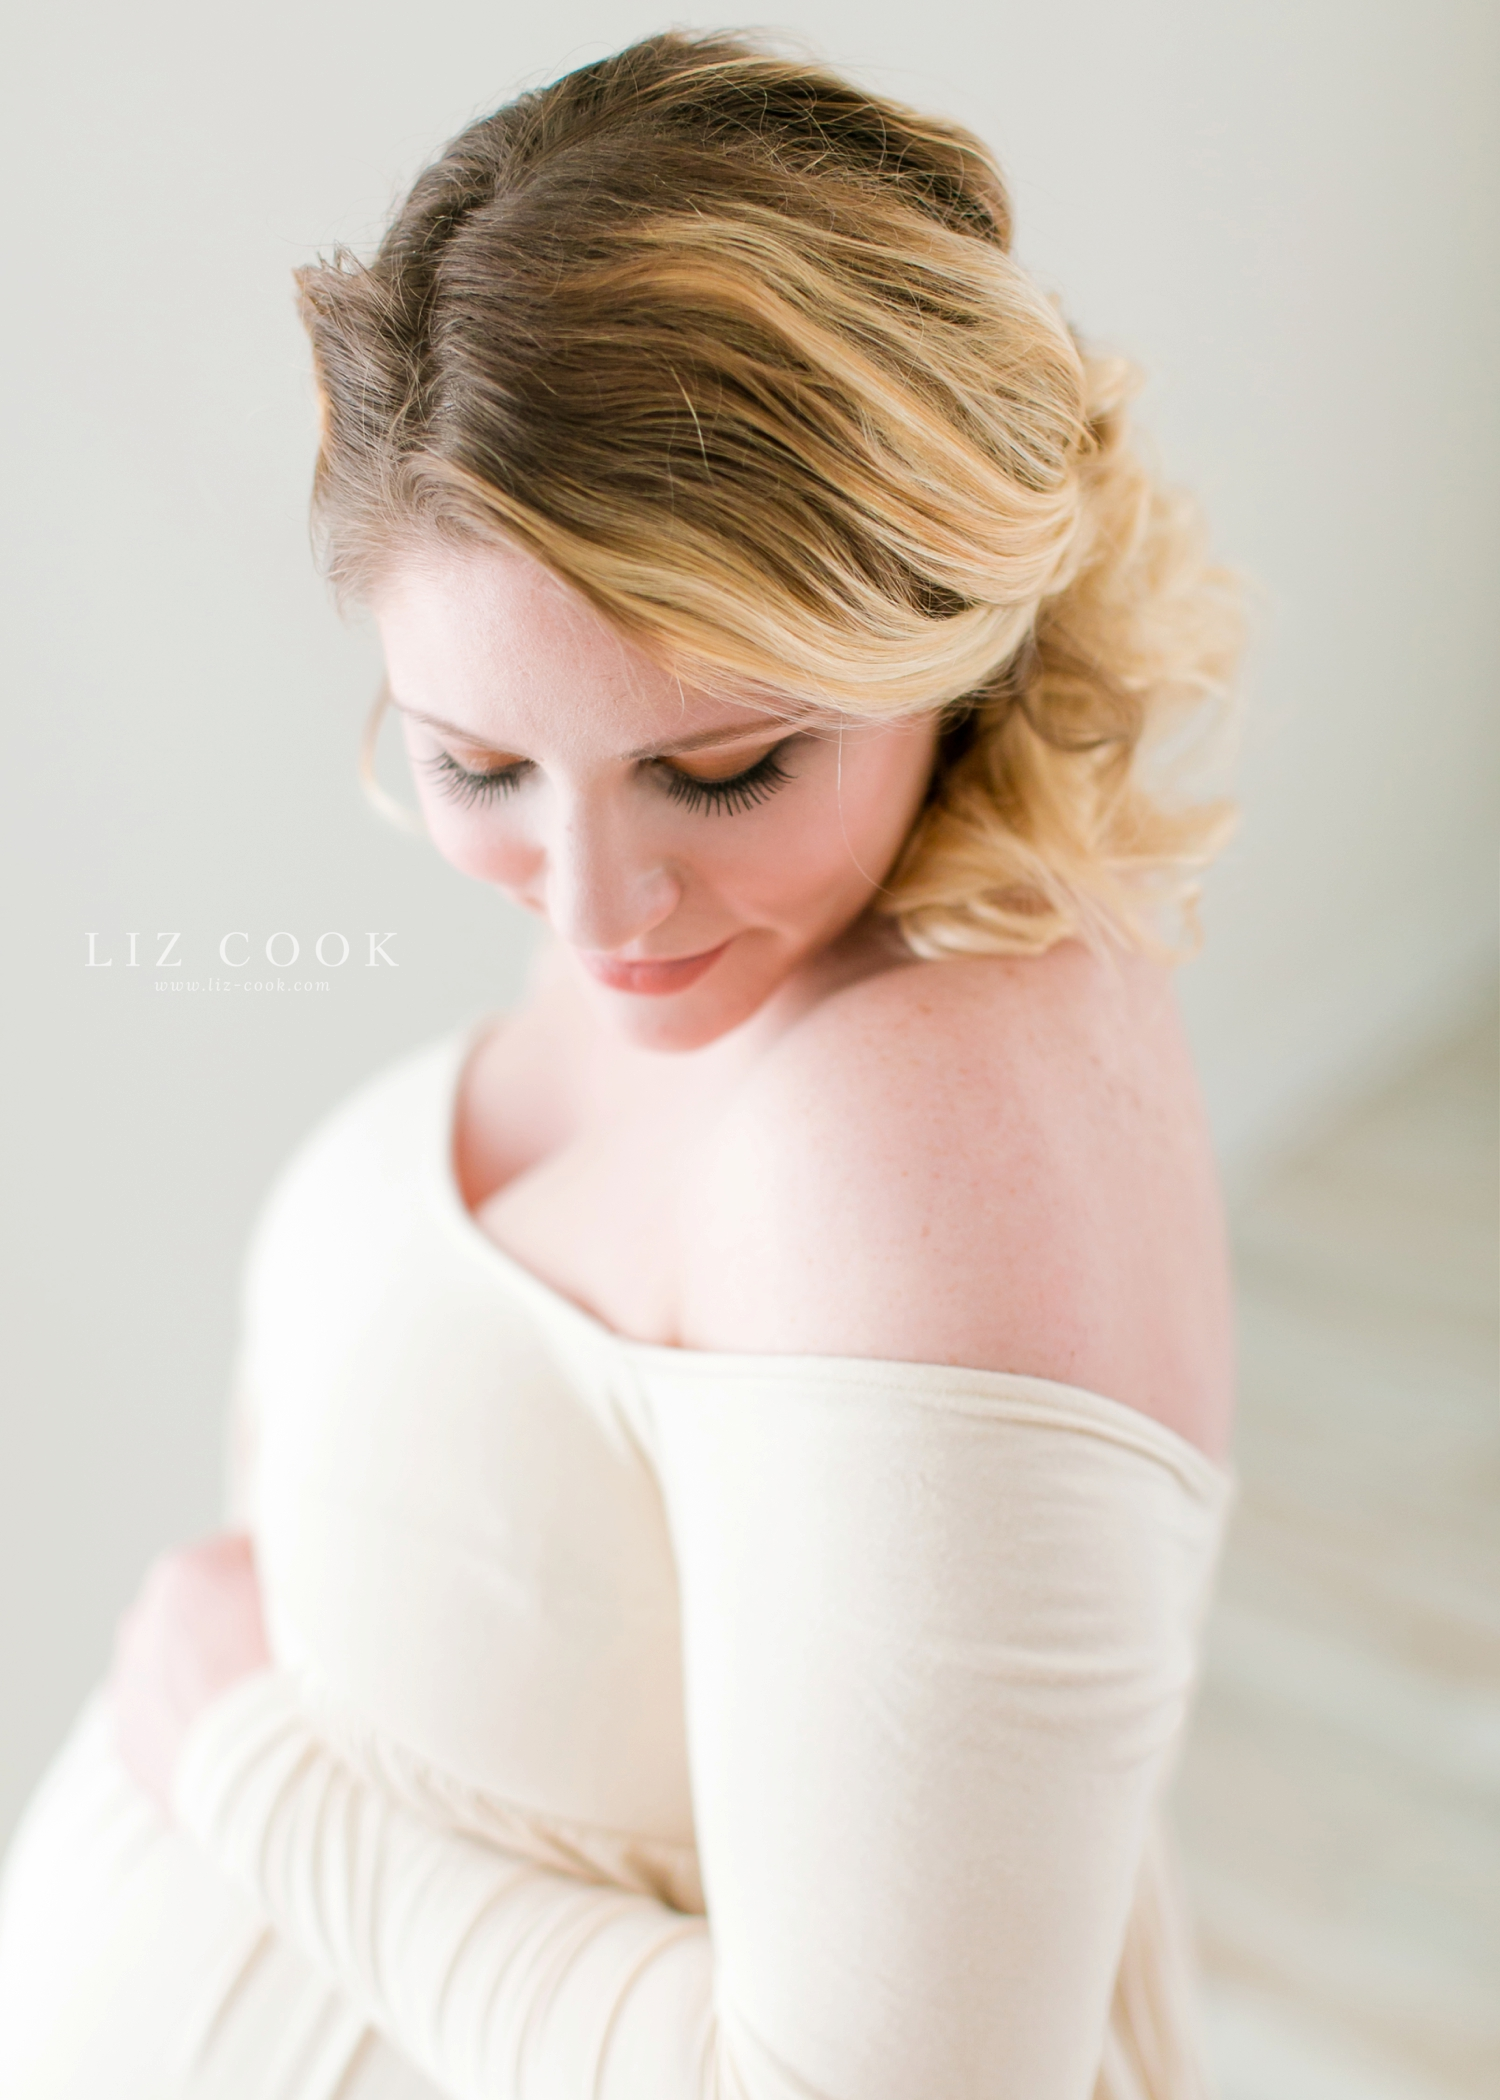 lynchburg_maternity_photographer_0008.jpg